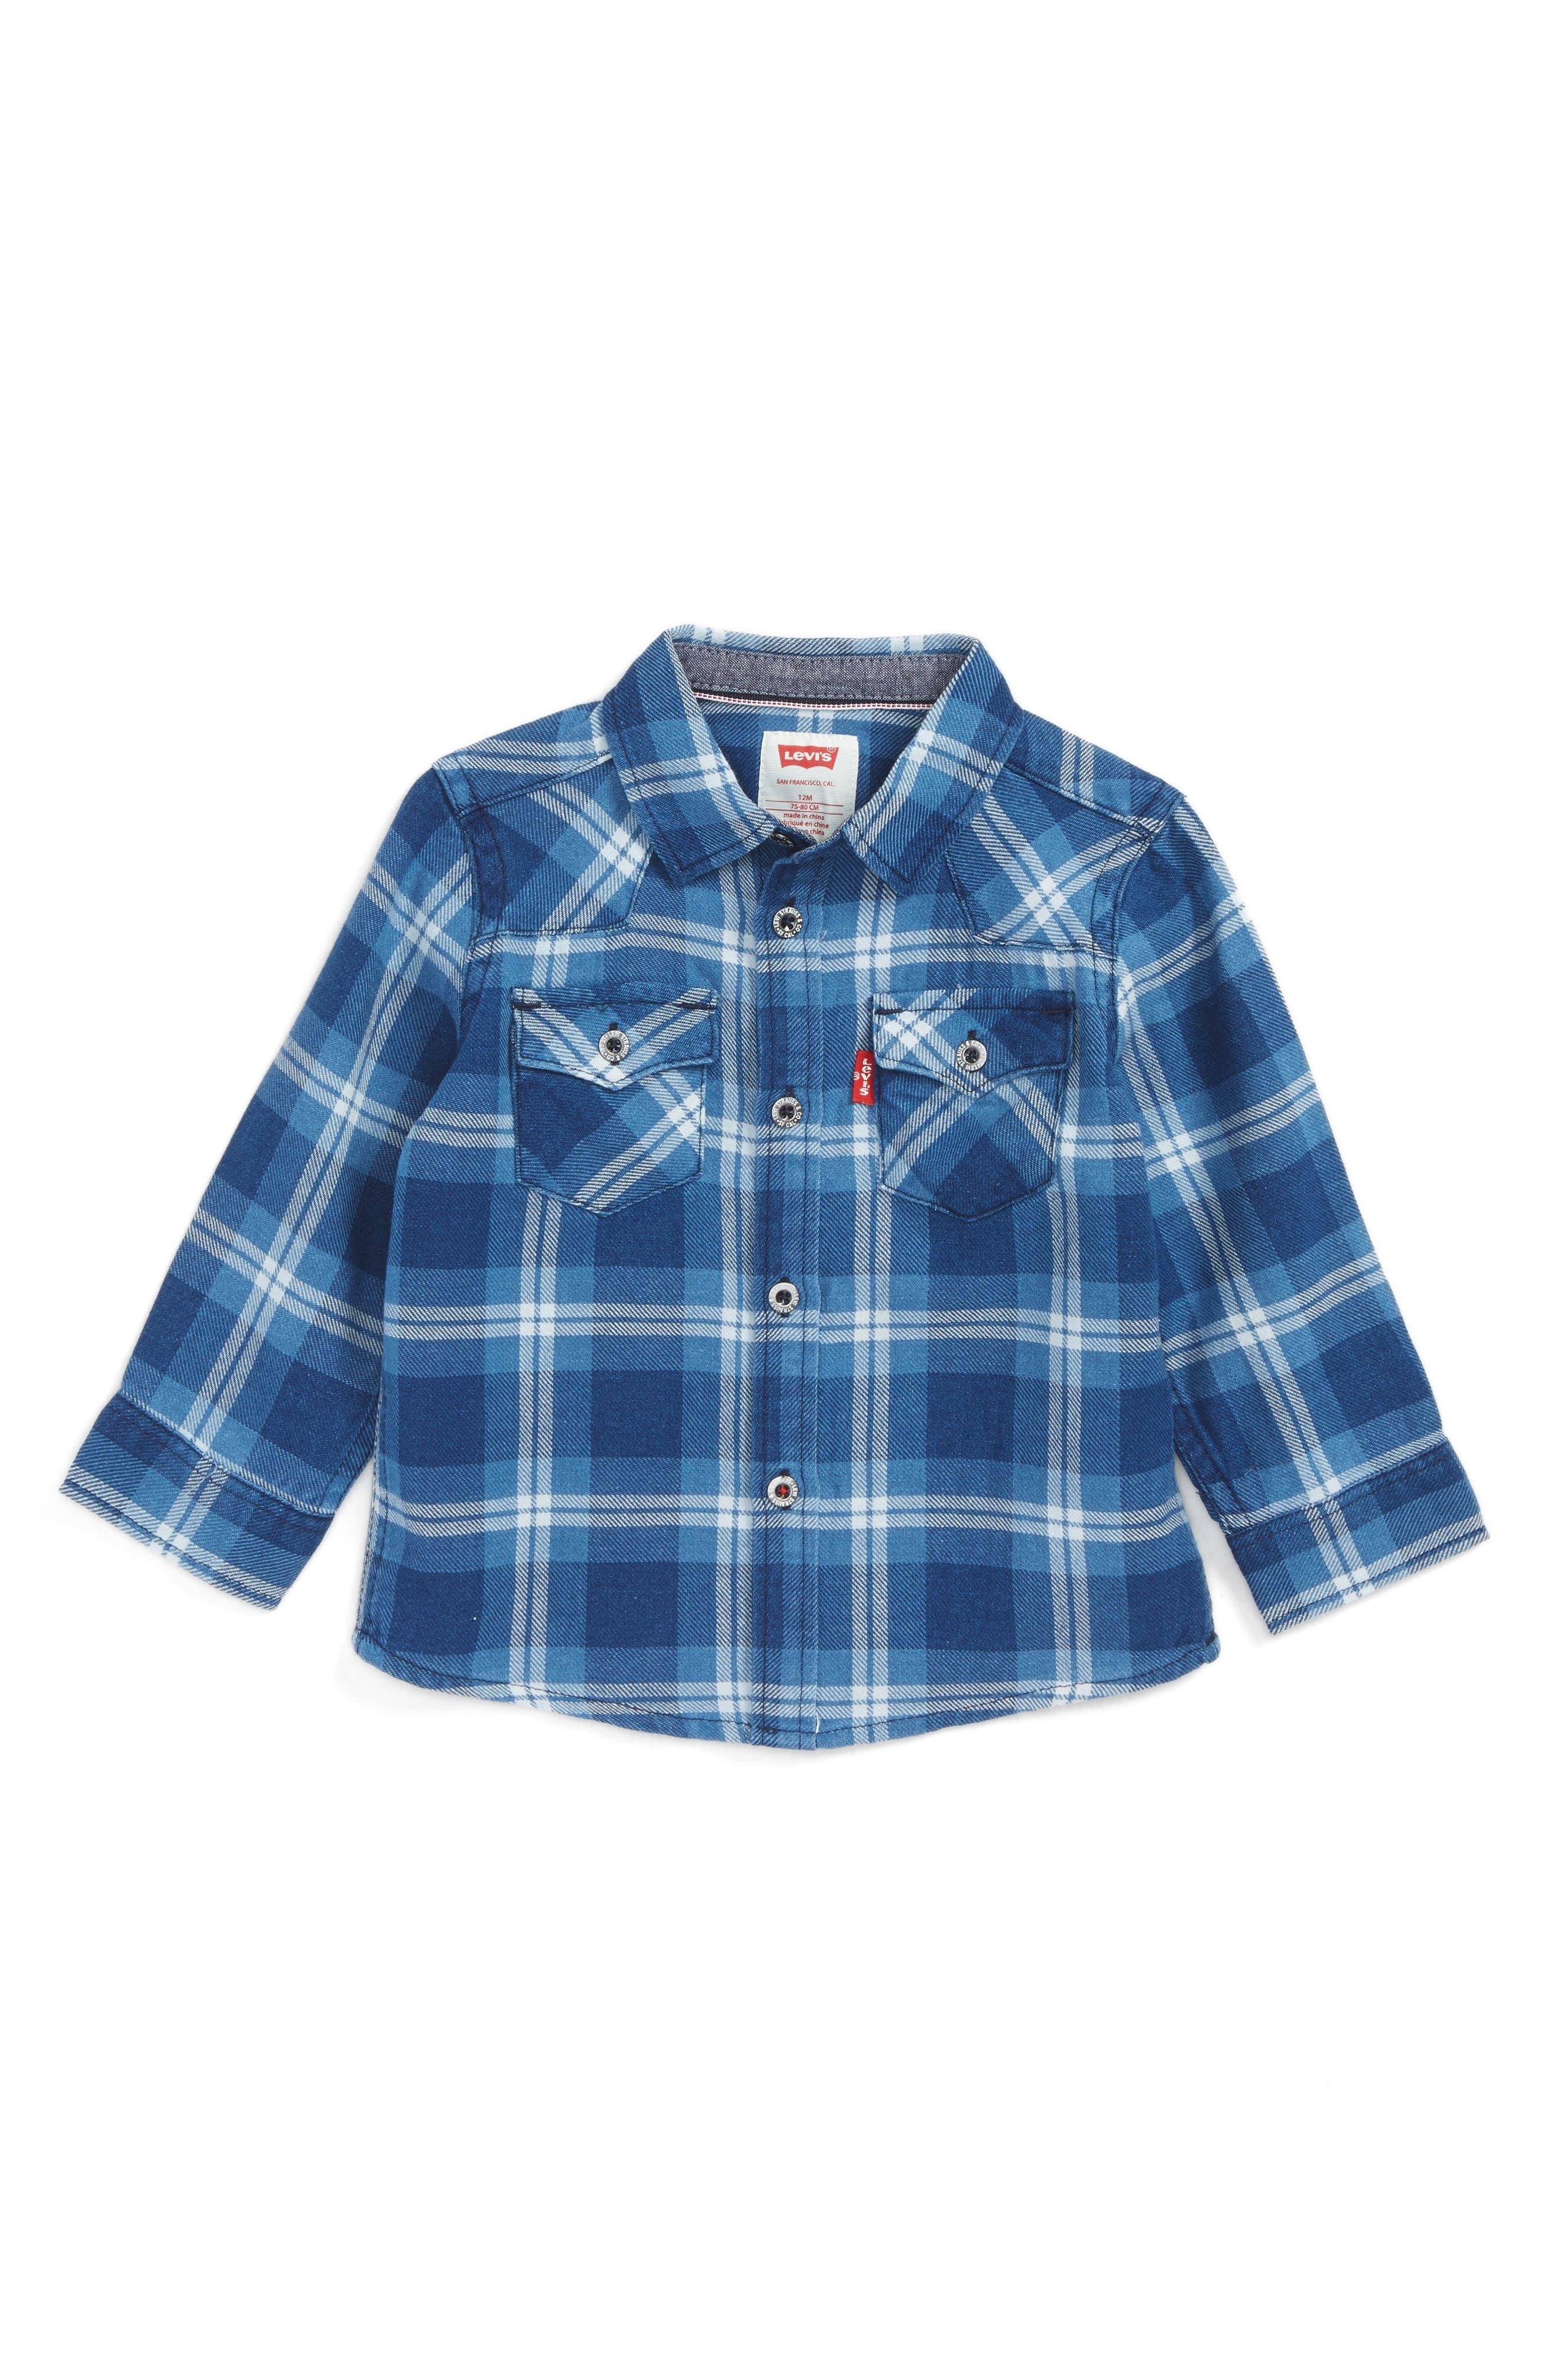 Barstow Plaid Shirt,                         Main,                         color, 463